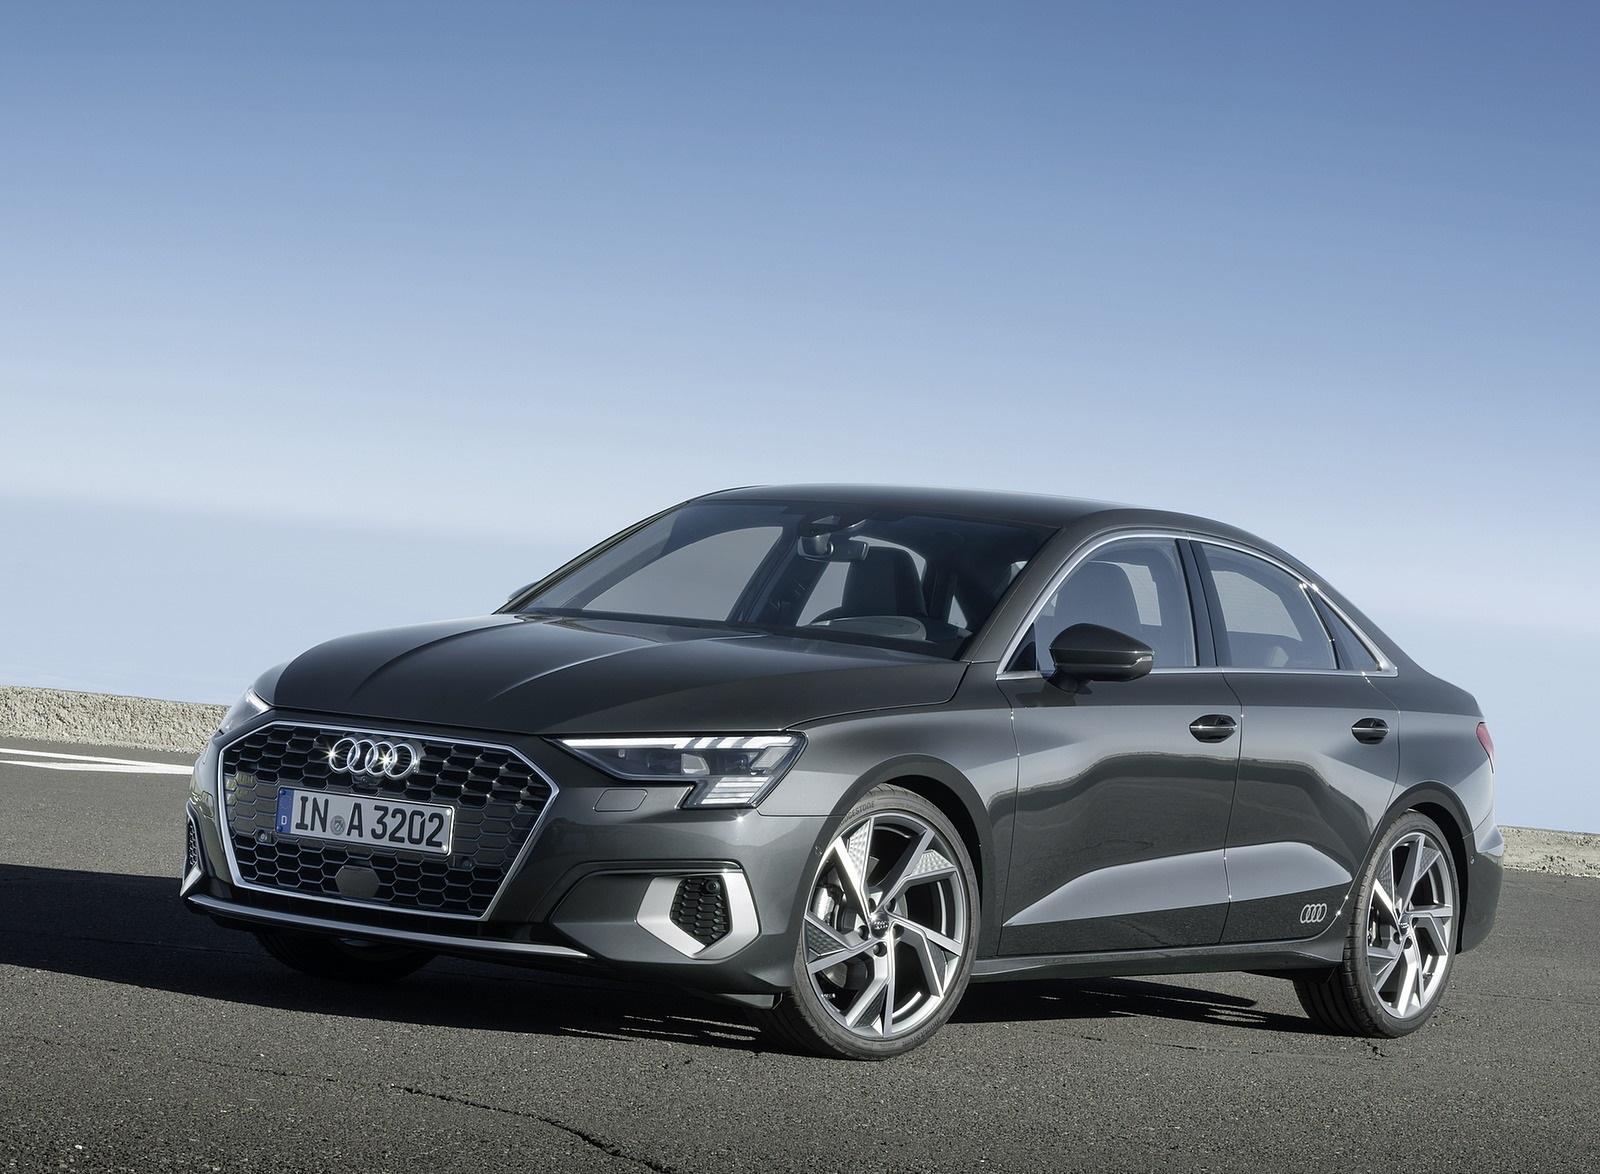 2021 Audi A3 Sedan (Color: Manhattan Gray) Front Three-Quarter Wallpapers (8)